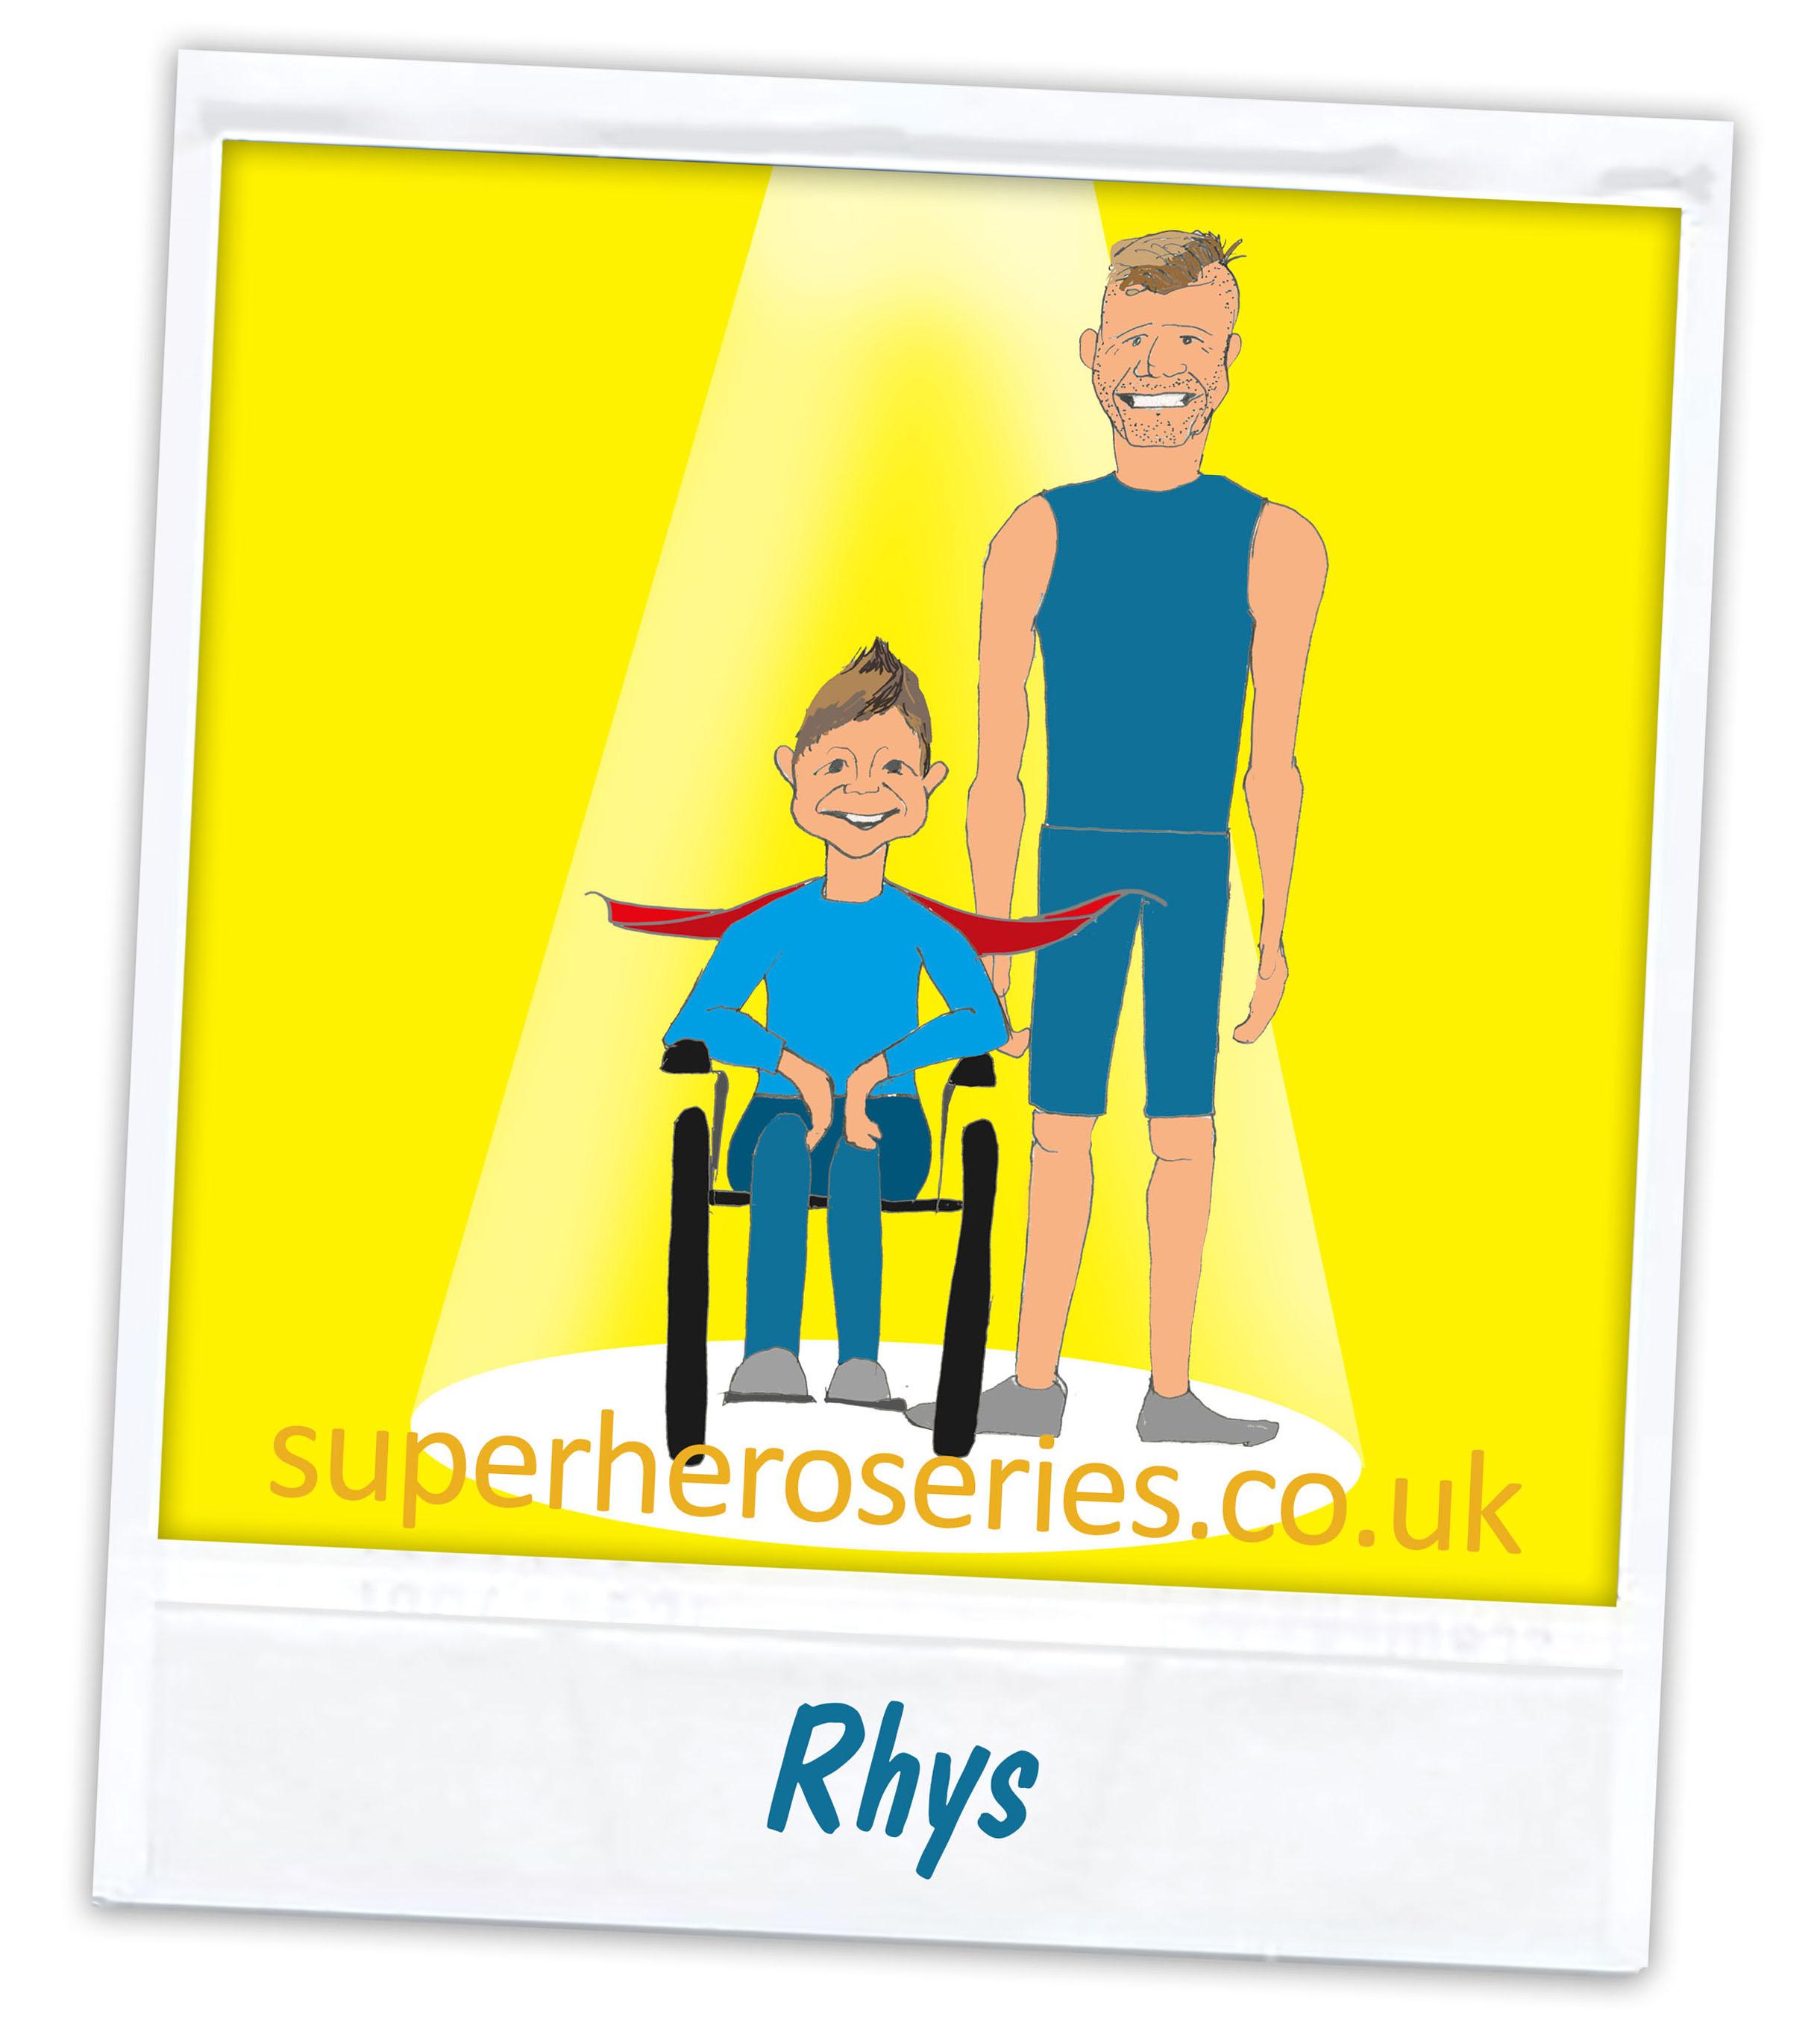 EDSH Rhys a.jpg